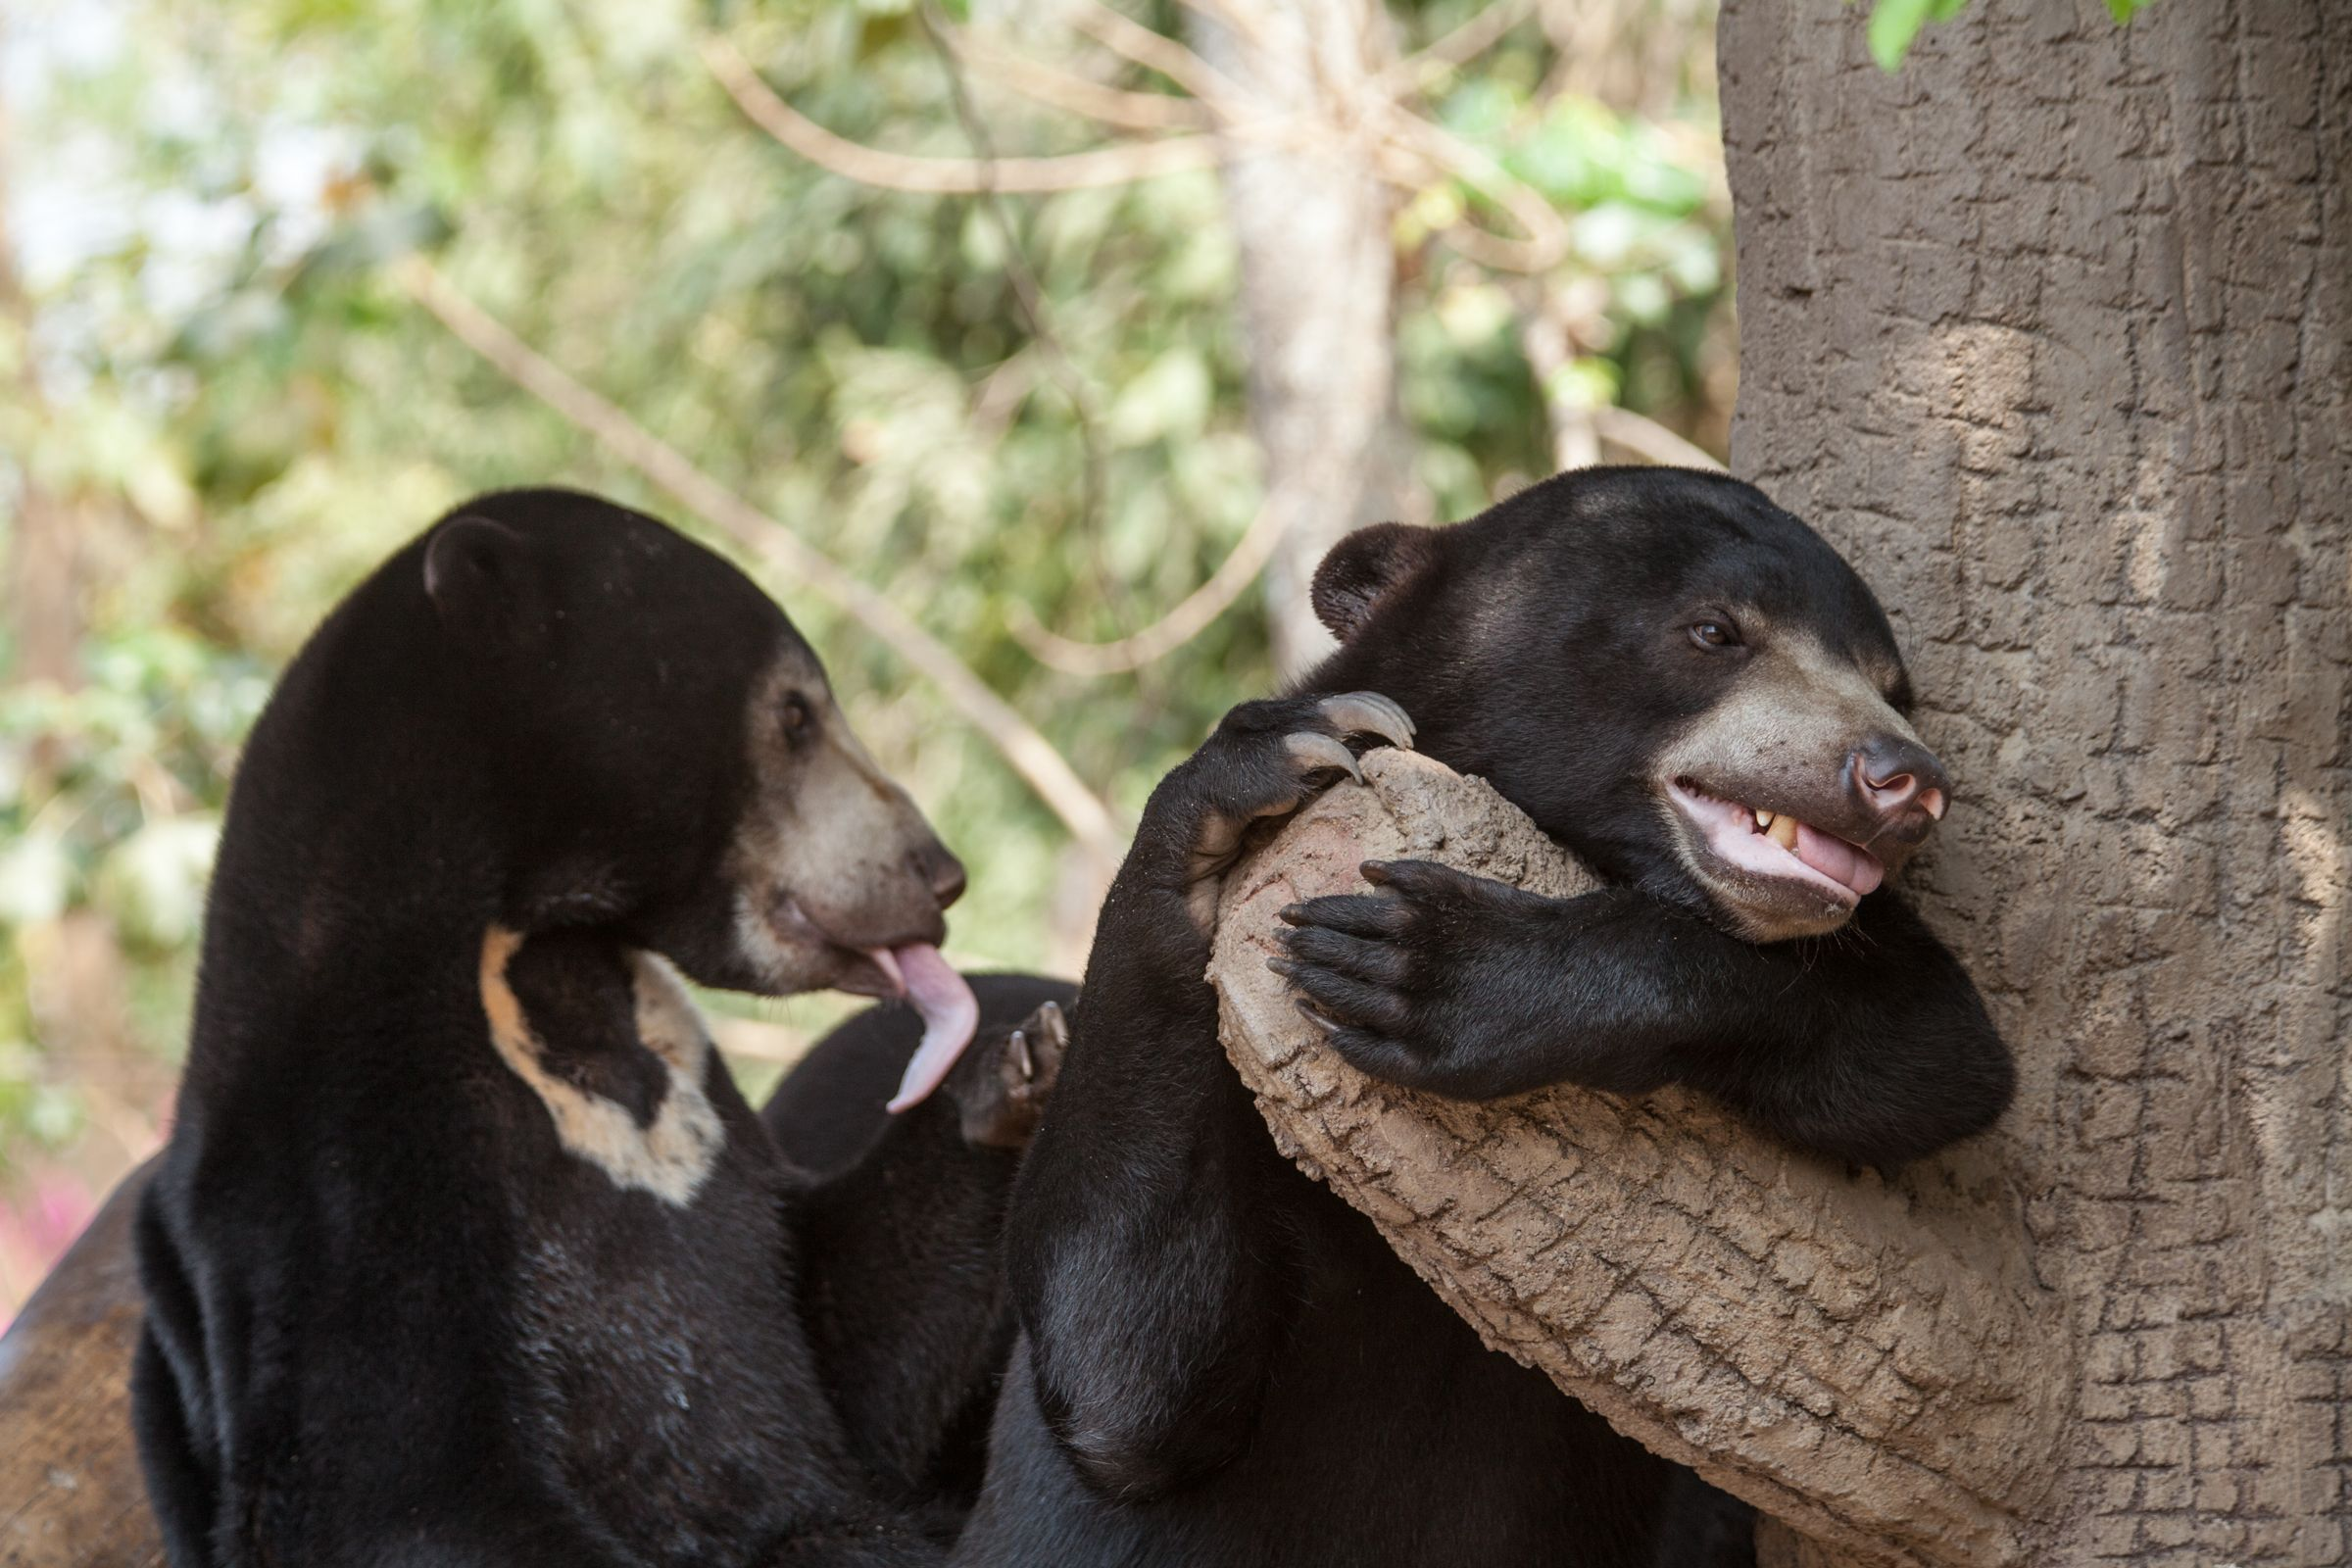 Playful sunbear cubs! #babyanimals #phnomtamao